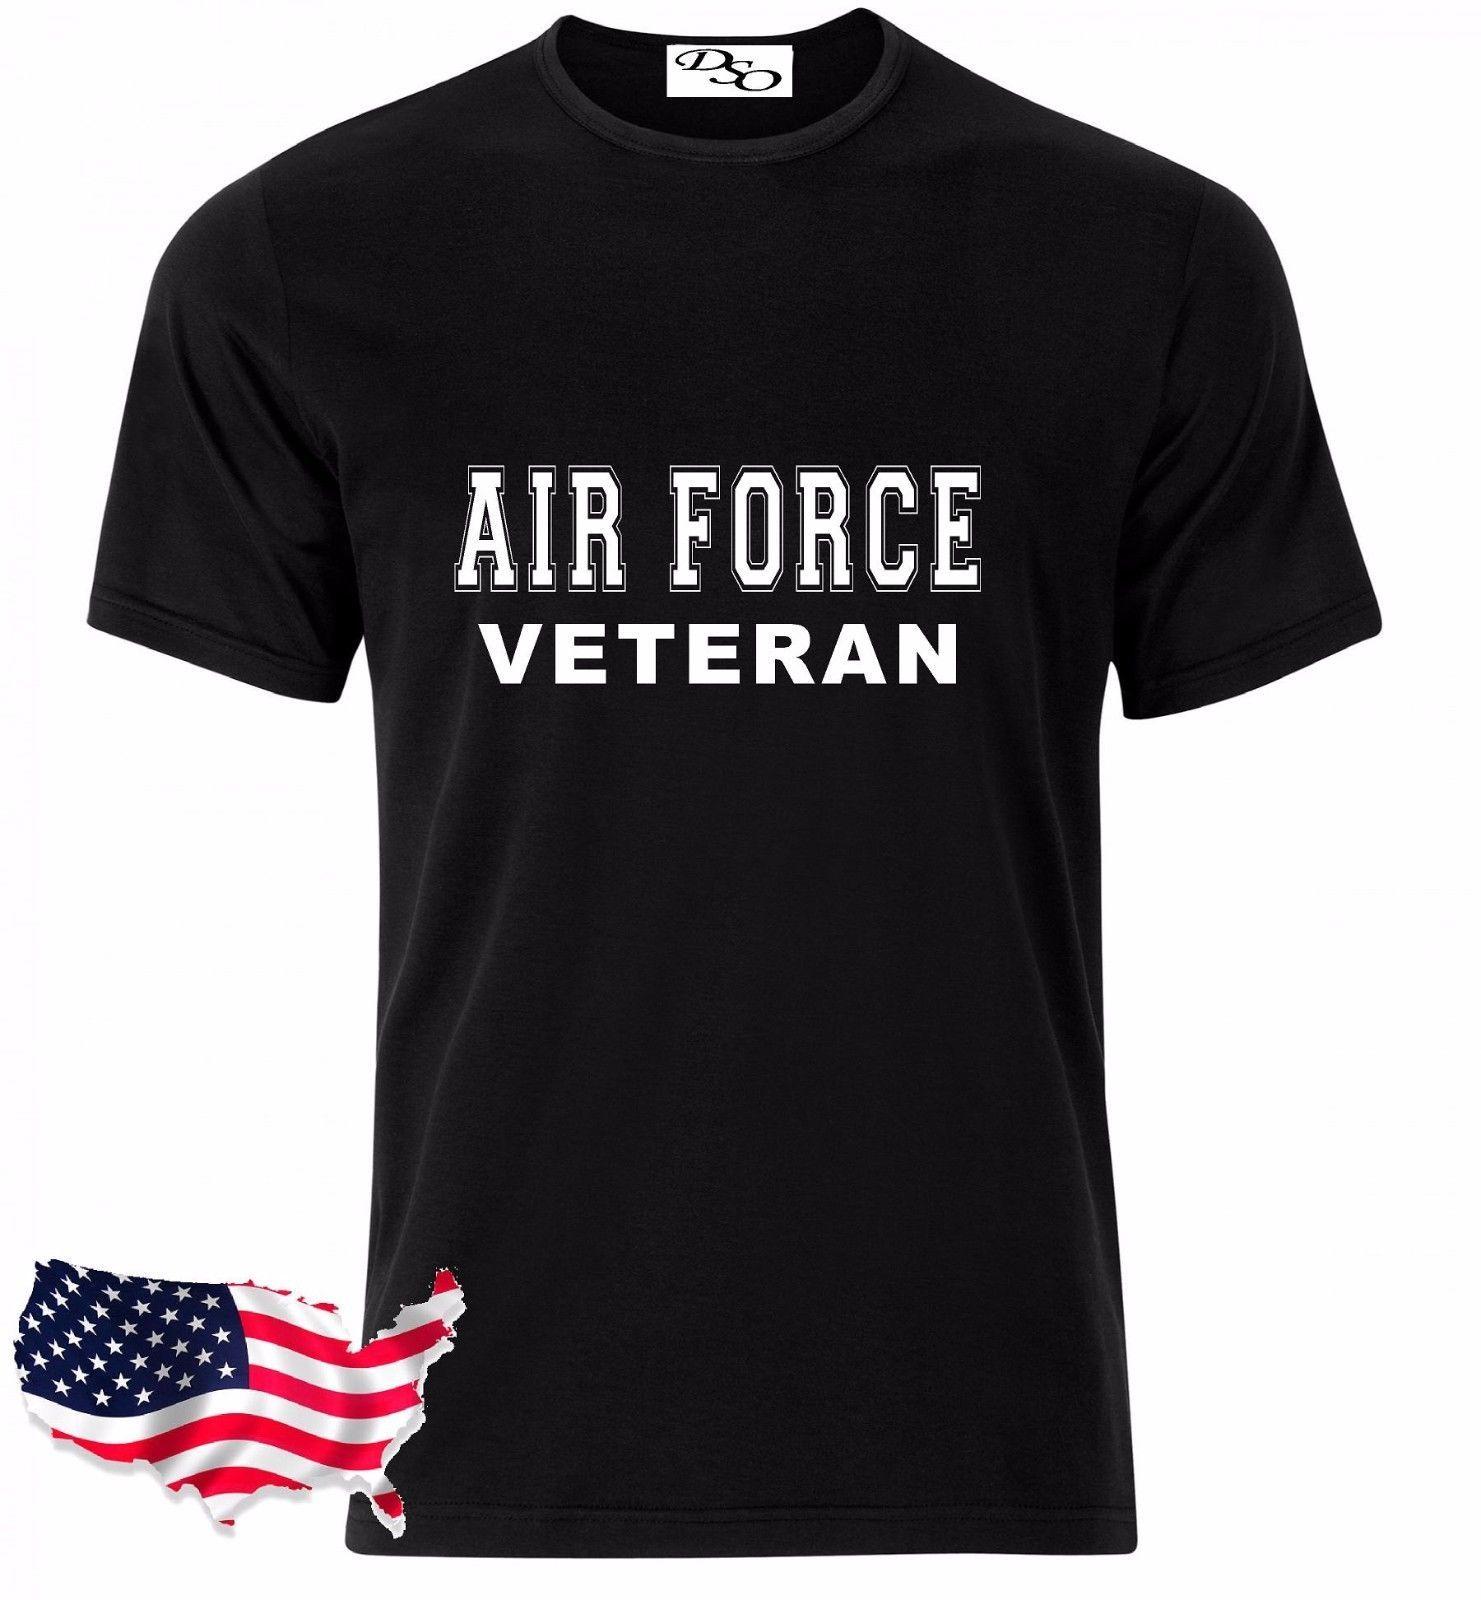 239c2bb8 Air Force T Shirt VETERAN USAF USMC US Army Navy Marines Military Funny  Unisex Casual Tshirt Top Crazy T Shirts T Shirt Prints From Teeslocker, ...